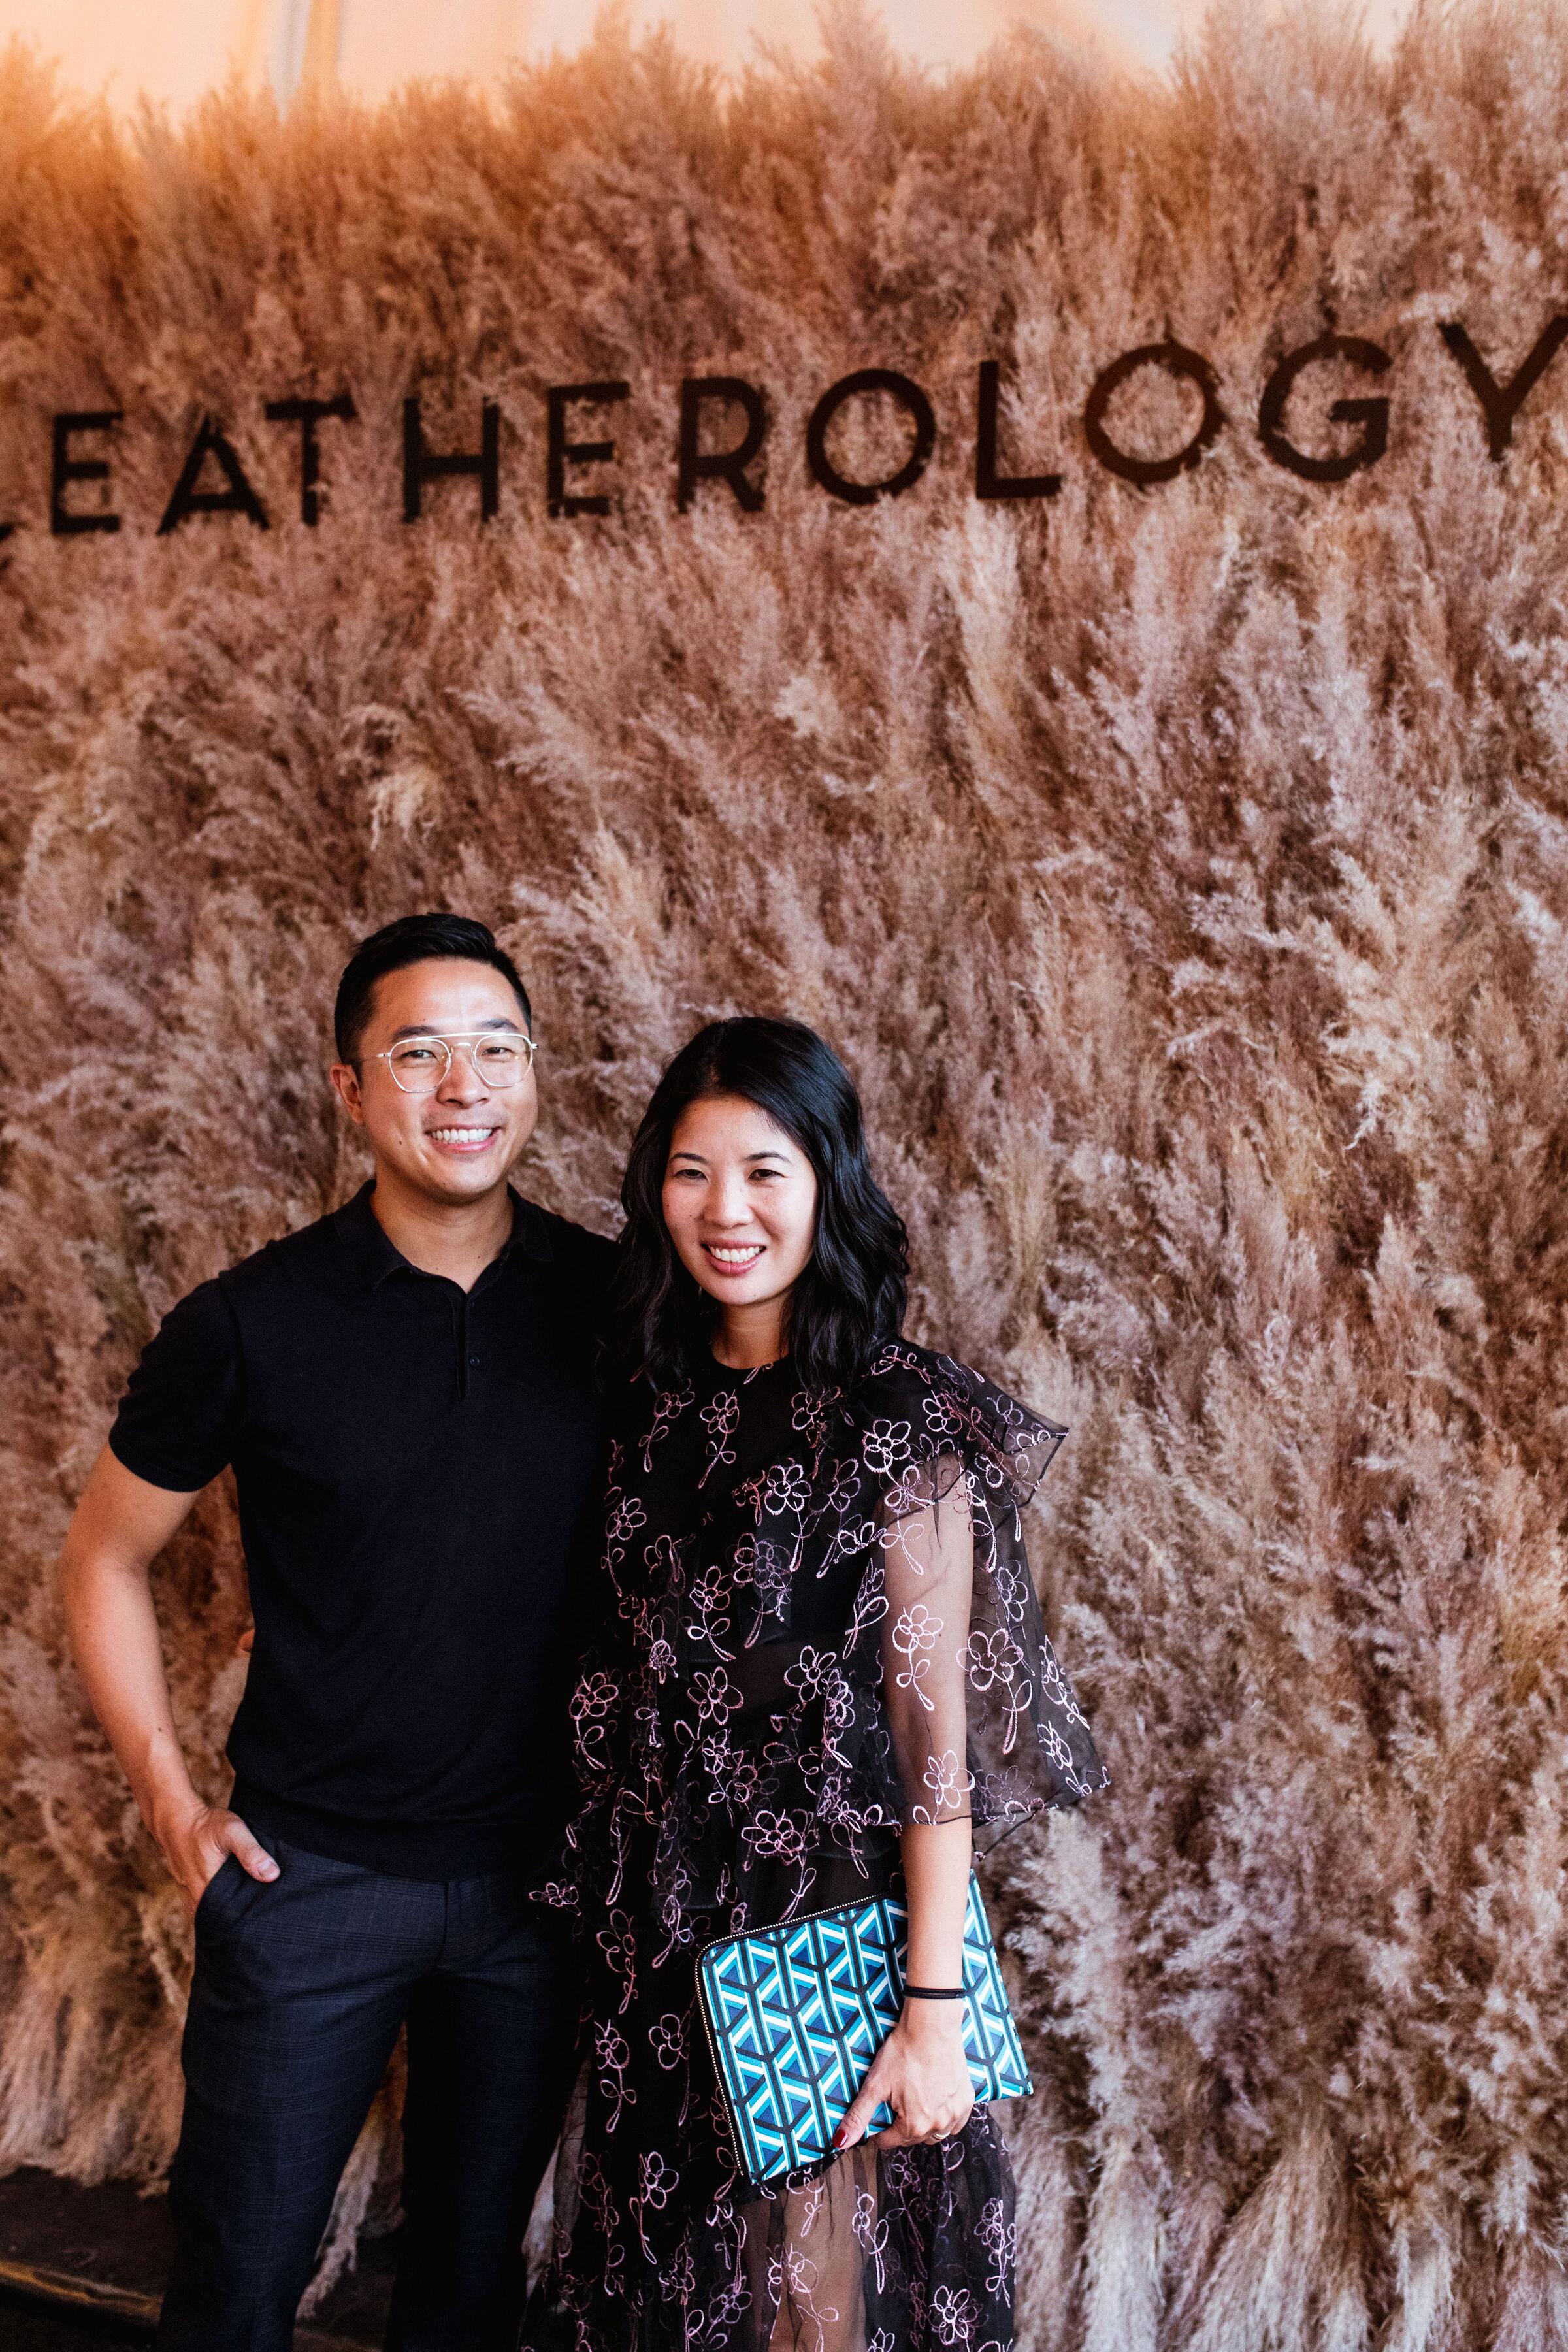 leatherology co-founders, rae and david liu